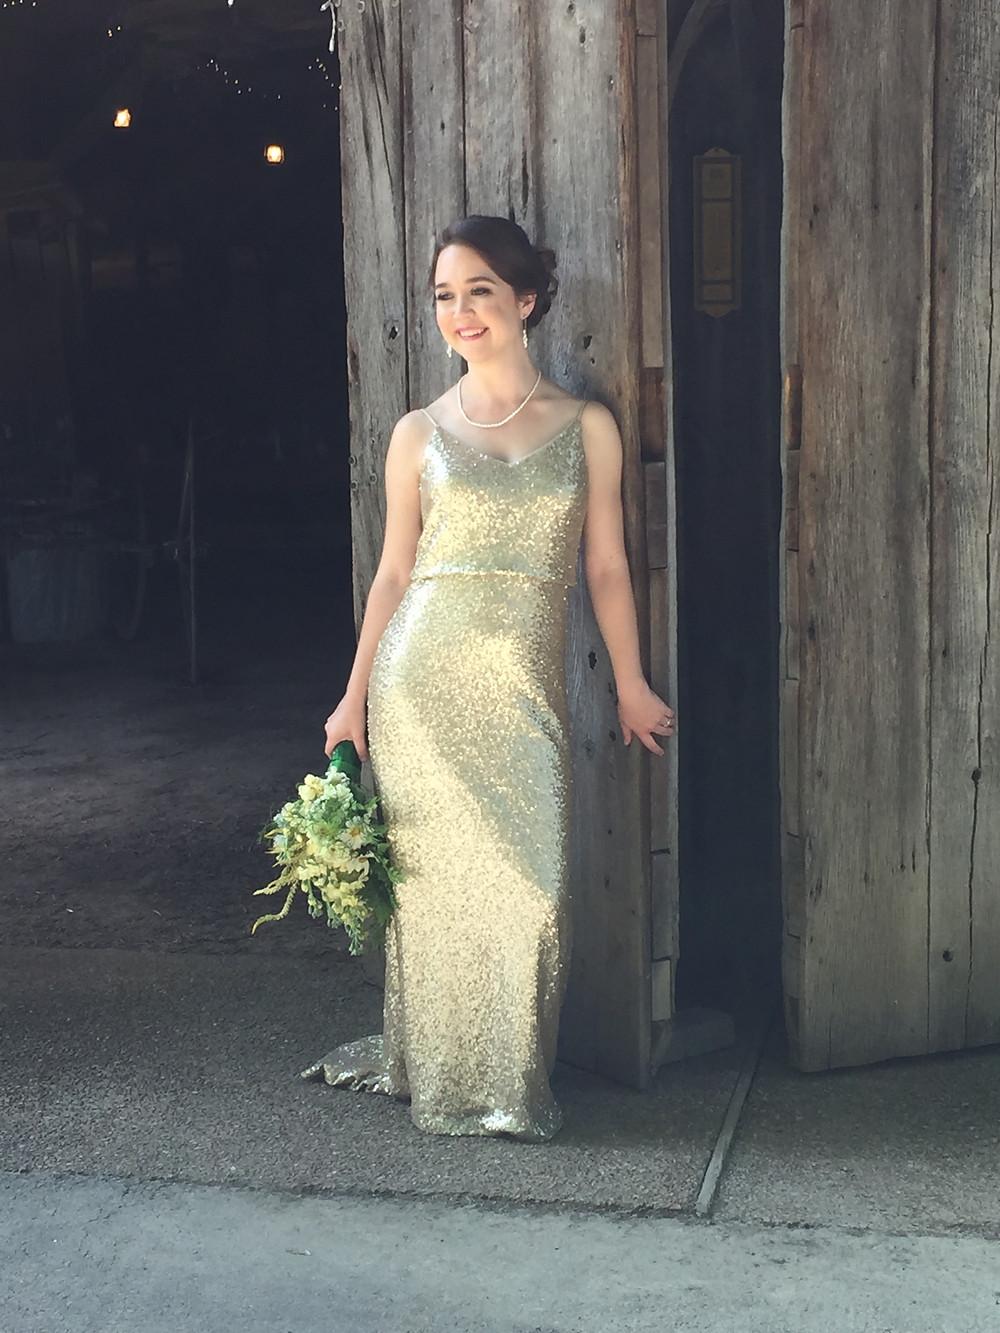 Bride in gold dress - Nashville, TN